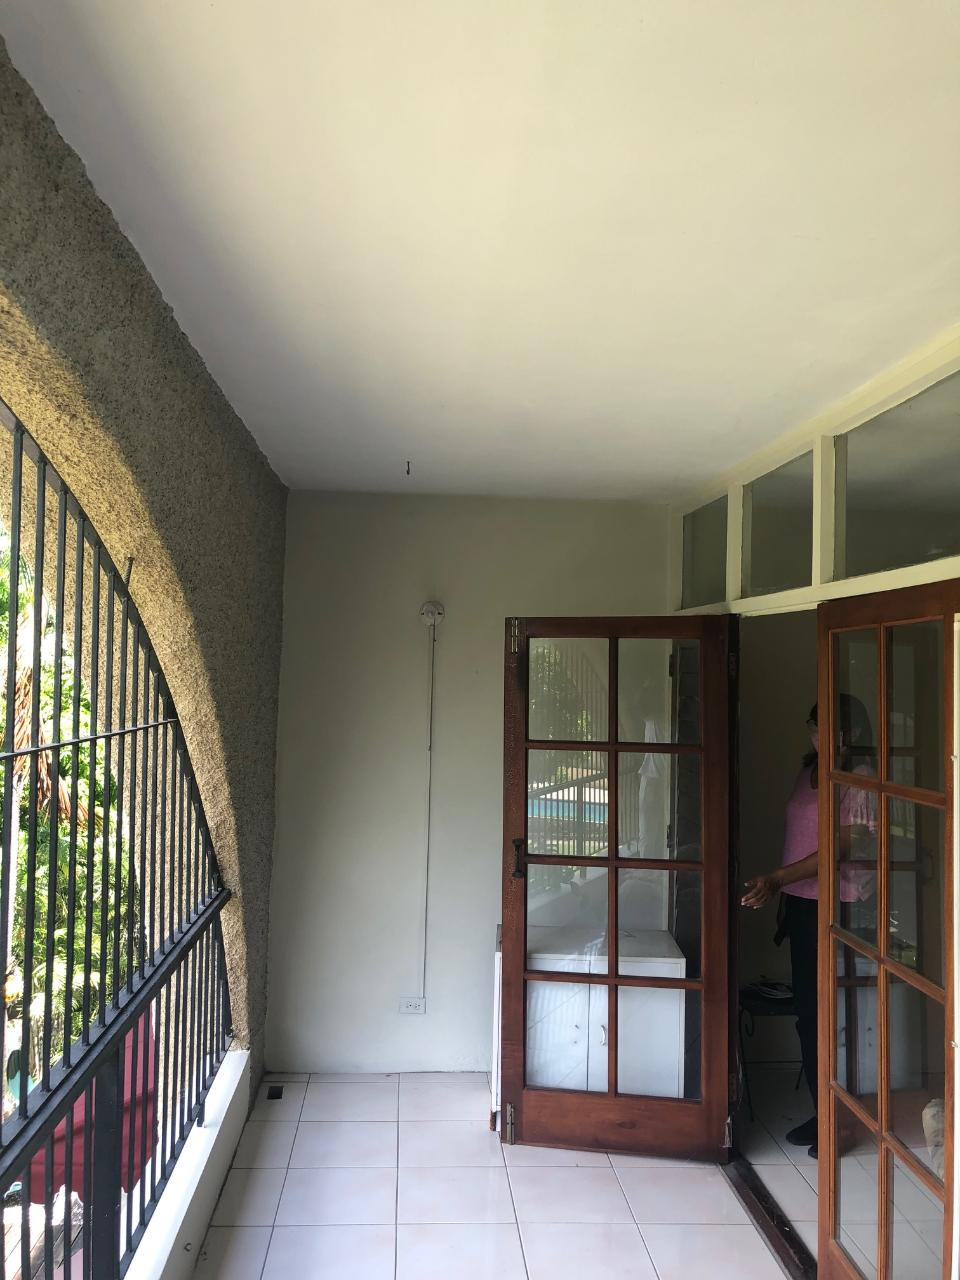 RE/MAX real estate, Jamaica, Kingston 6, HOPE ROAD, KINGSTON 06 Kingston & St. Andrew Kingston 6